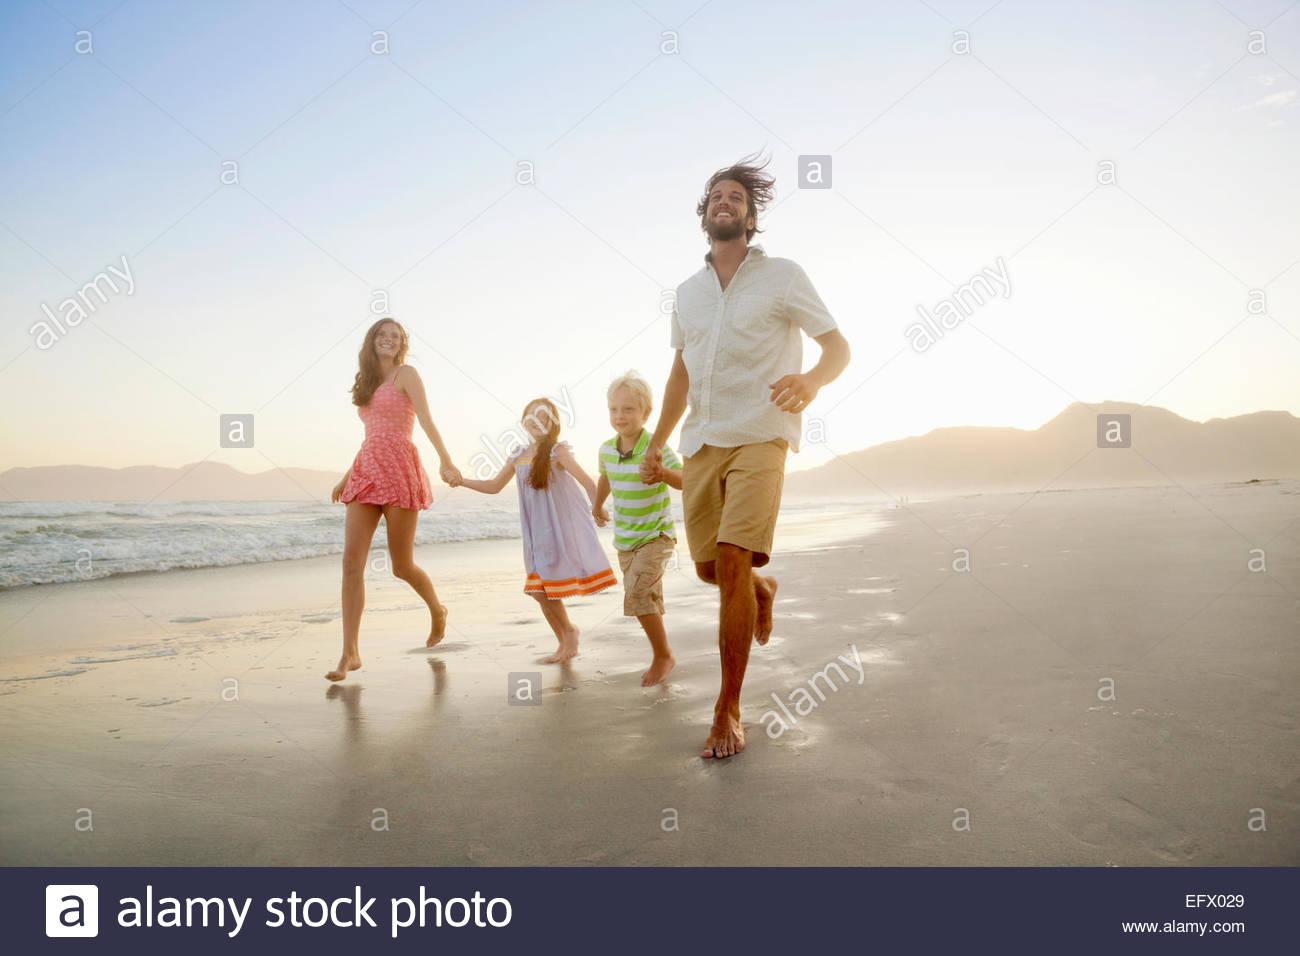 Famille heureuse, tenant les mains, s'exécutant sur sunny beach Photo Stock